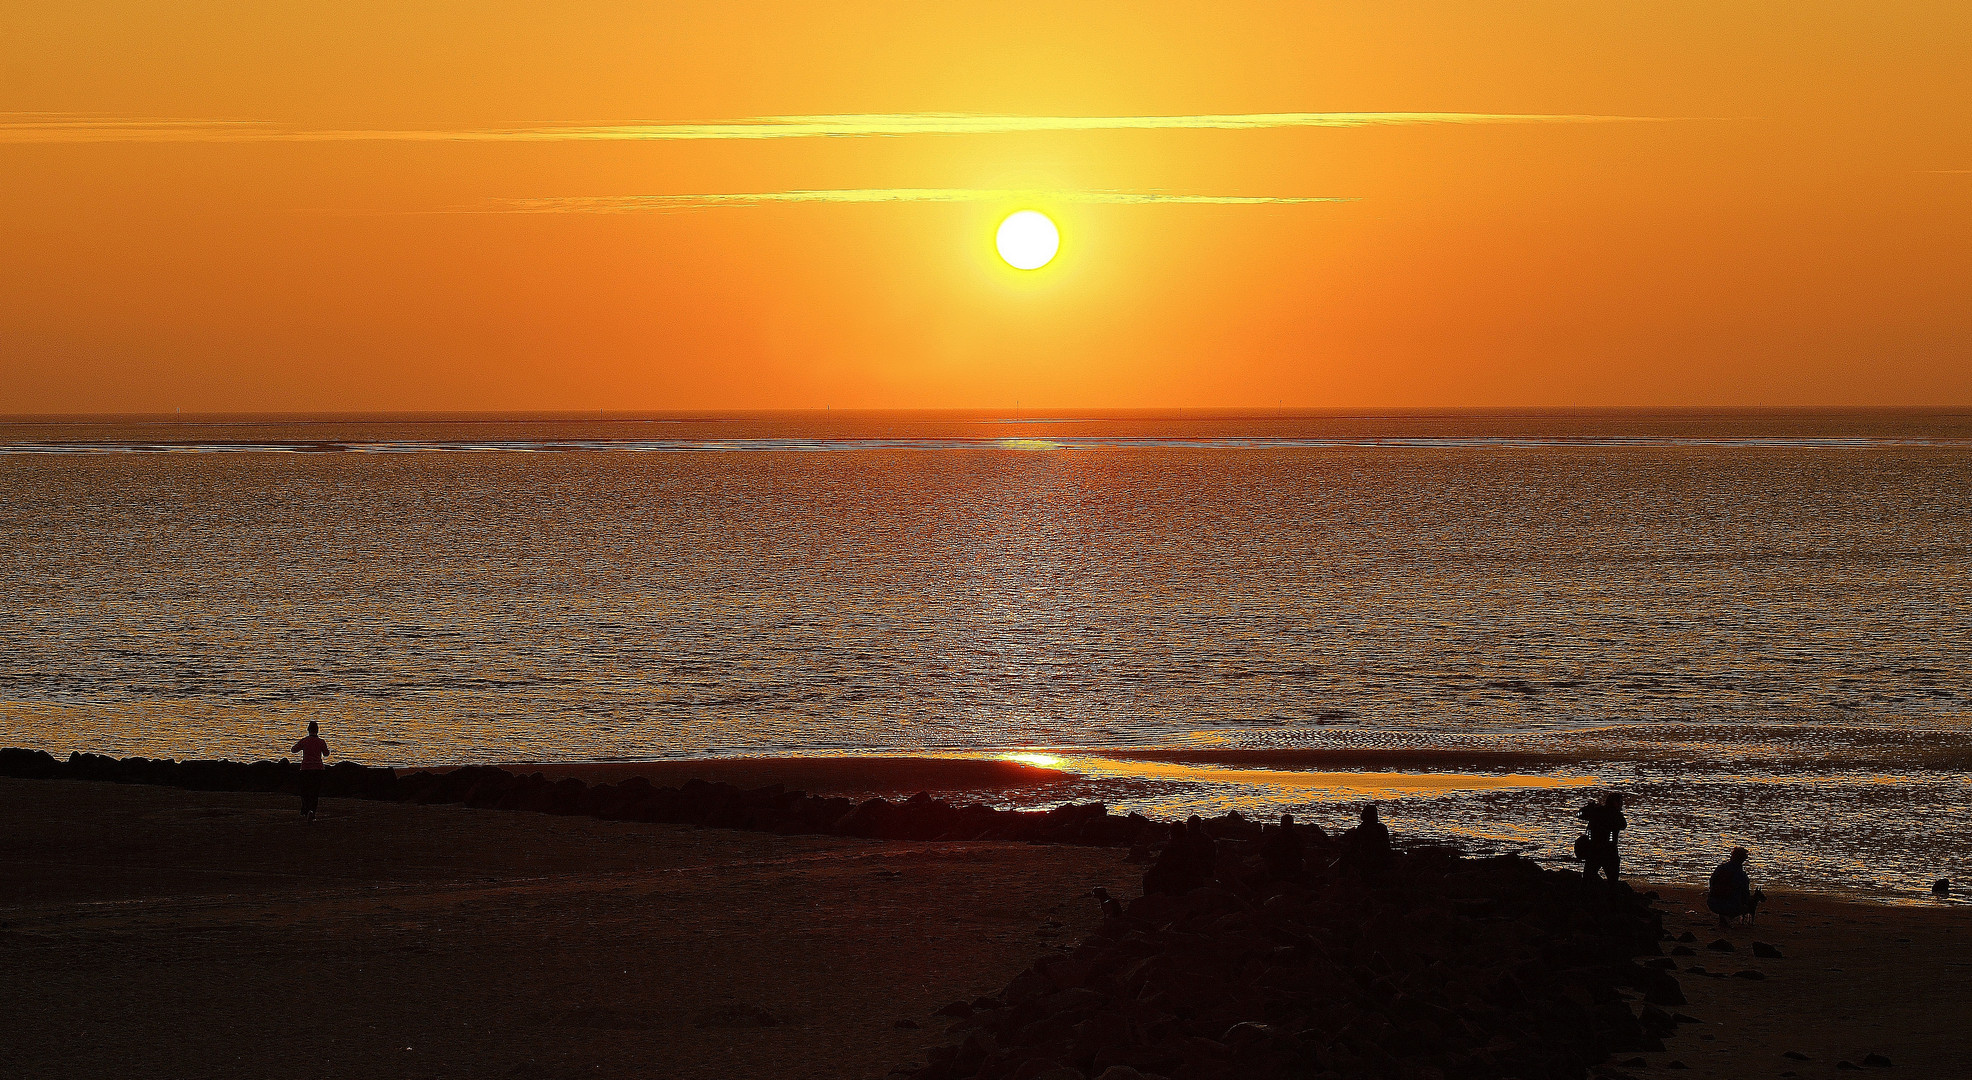 Sonnenuntergang auf Föhr 2